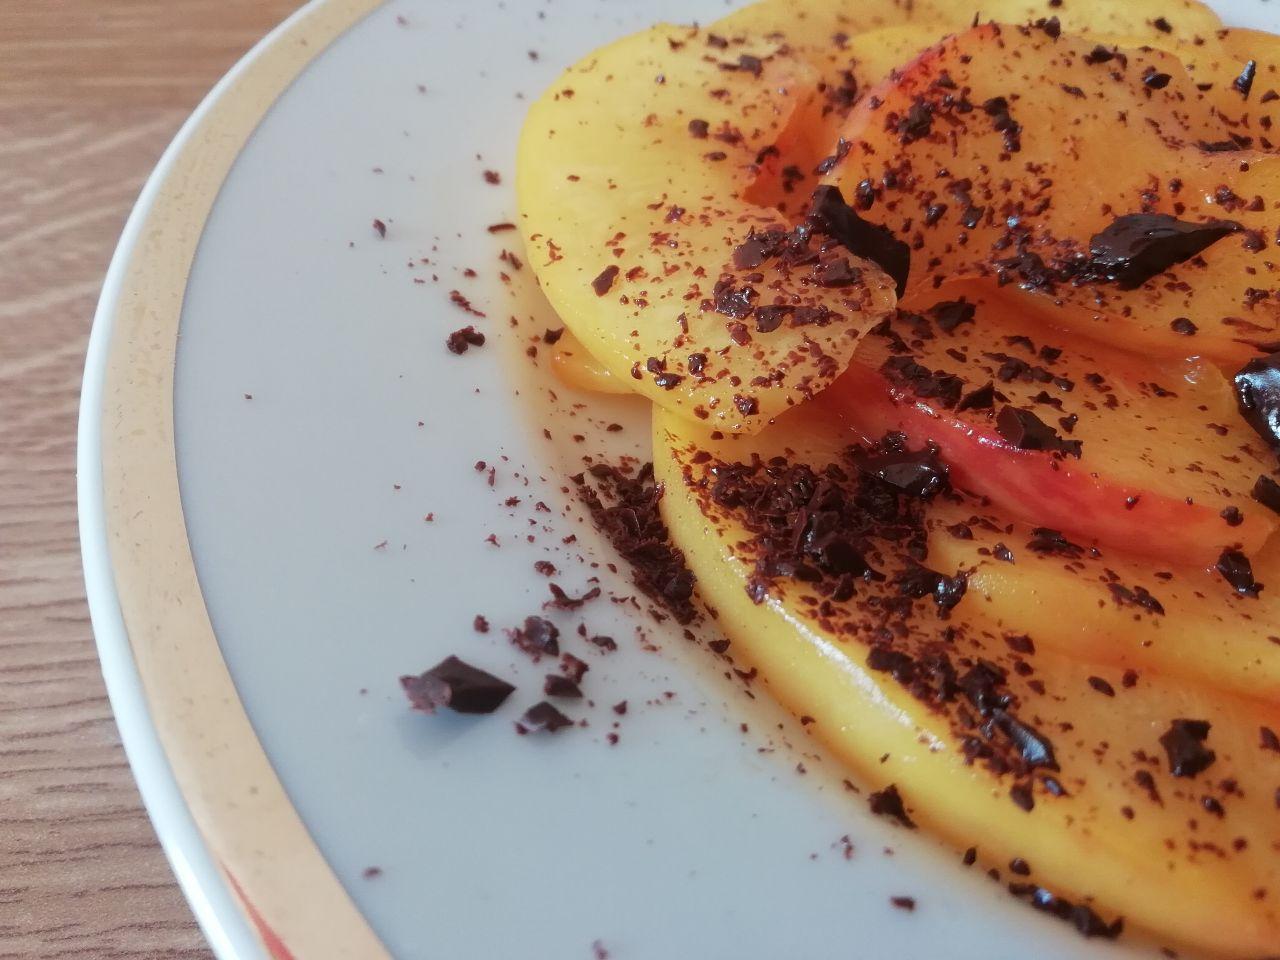 Dolci a base di sola frutta: pesche caramellate all'arancia con cioccolato fondente!